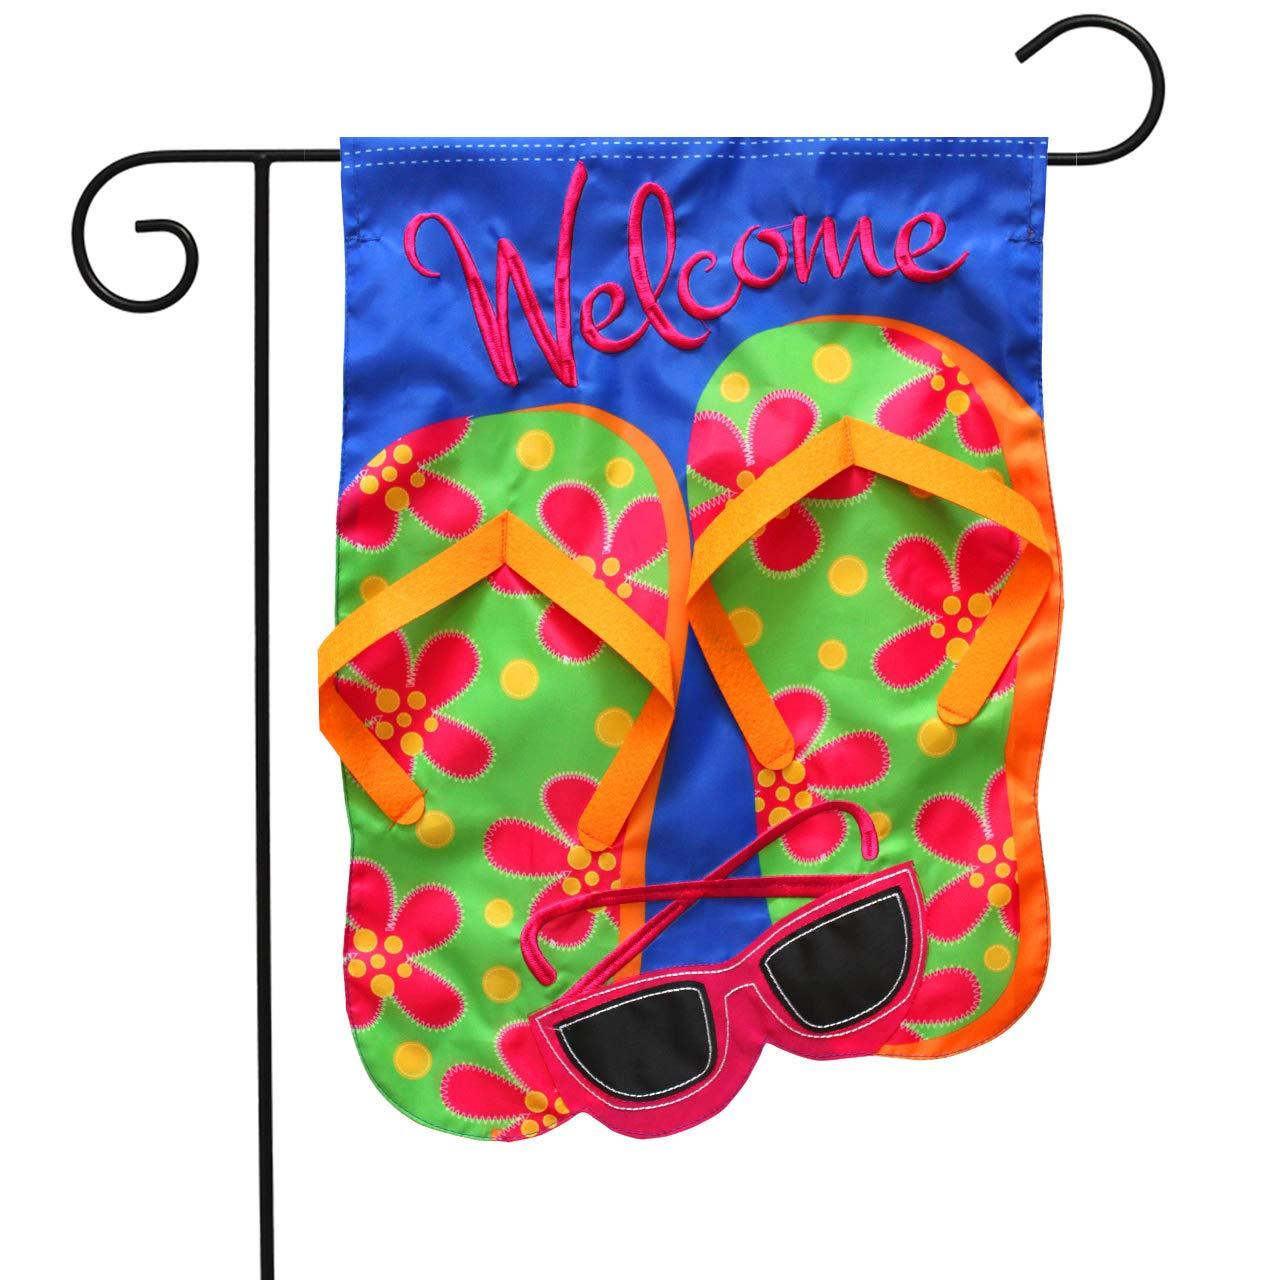 "Briarwood Lane Flip Flops Applique Summer Garden Flag Welcome Sunglasses 12.5"" x 18"""